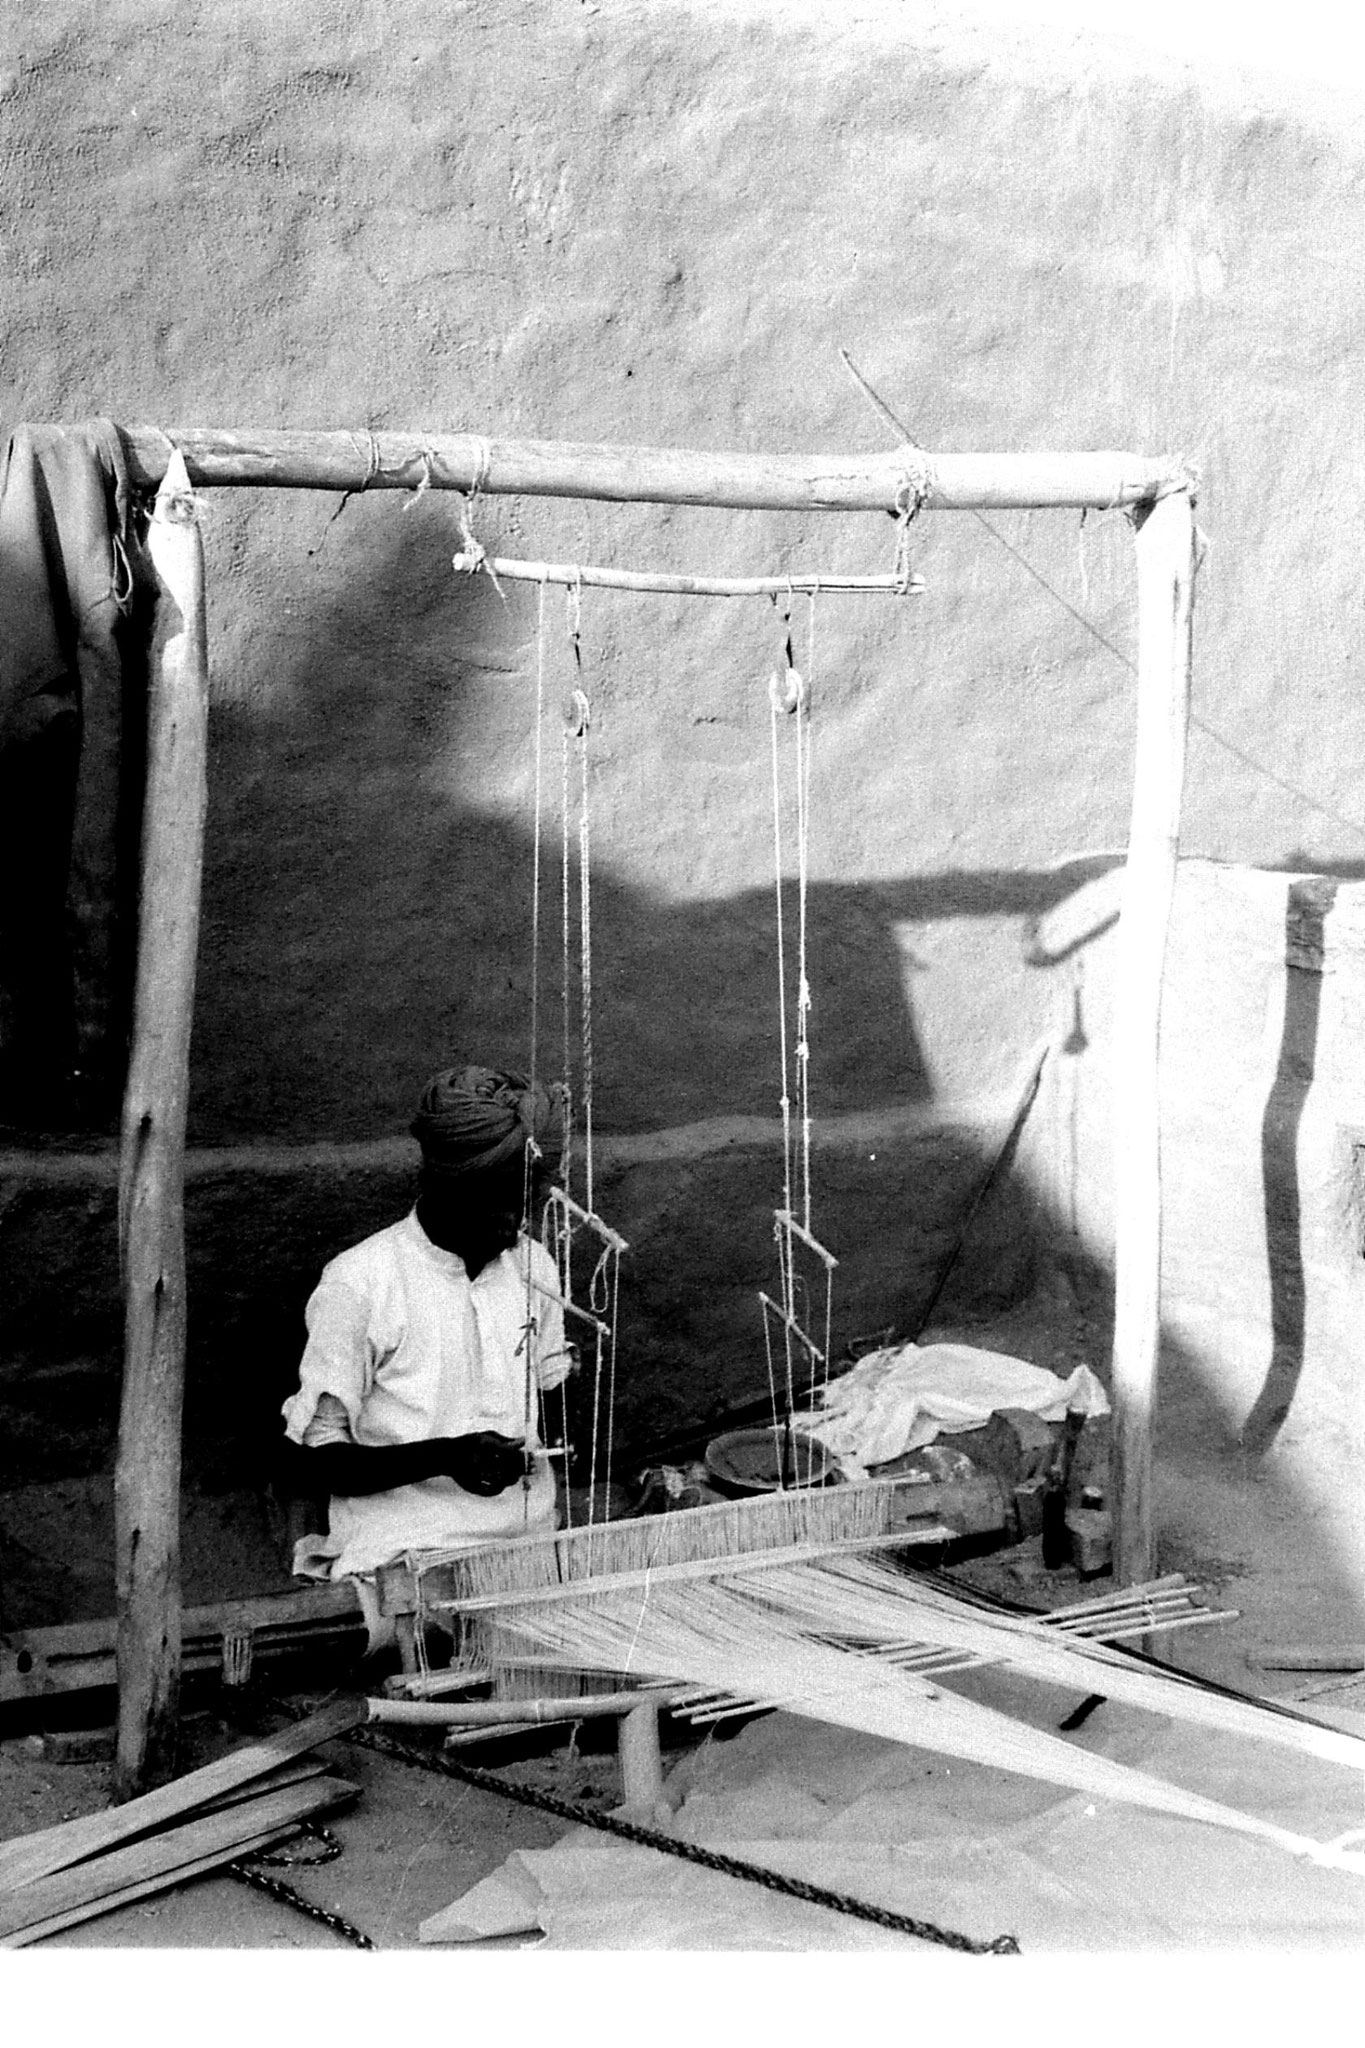 8/12/1989: 16: Udaipur, Shilp Gram Craft Centre